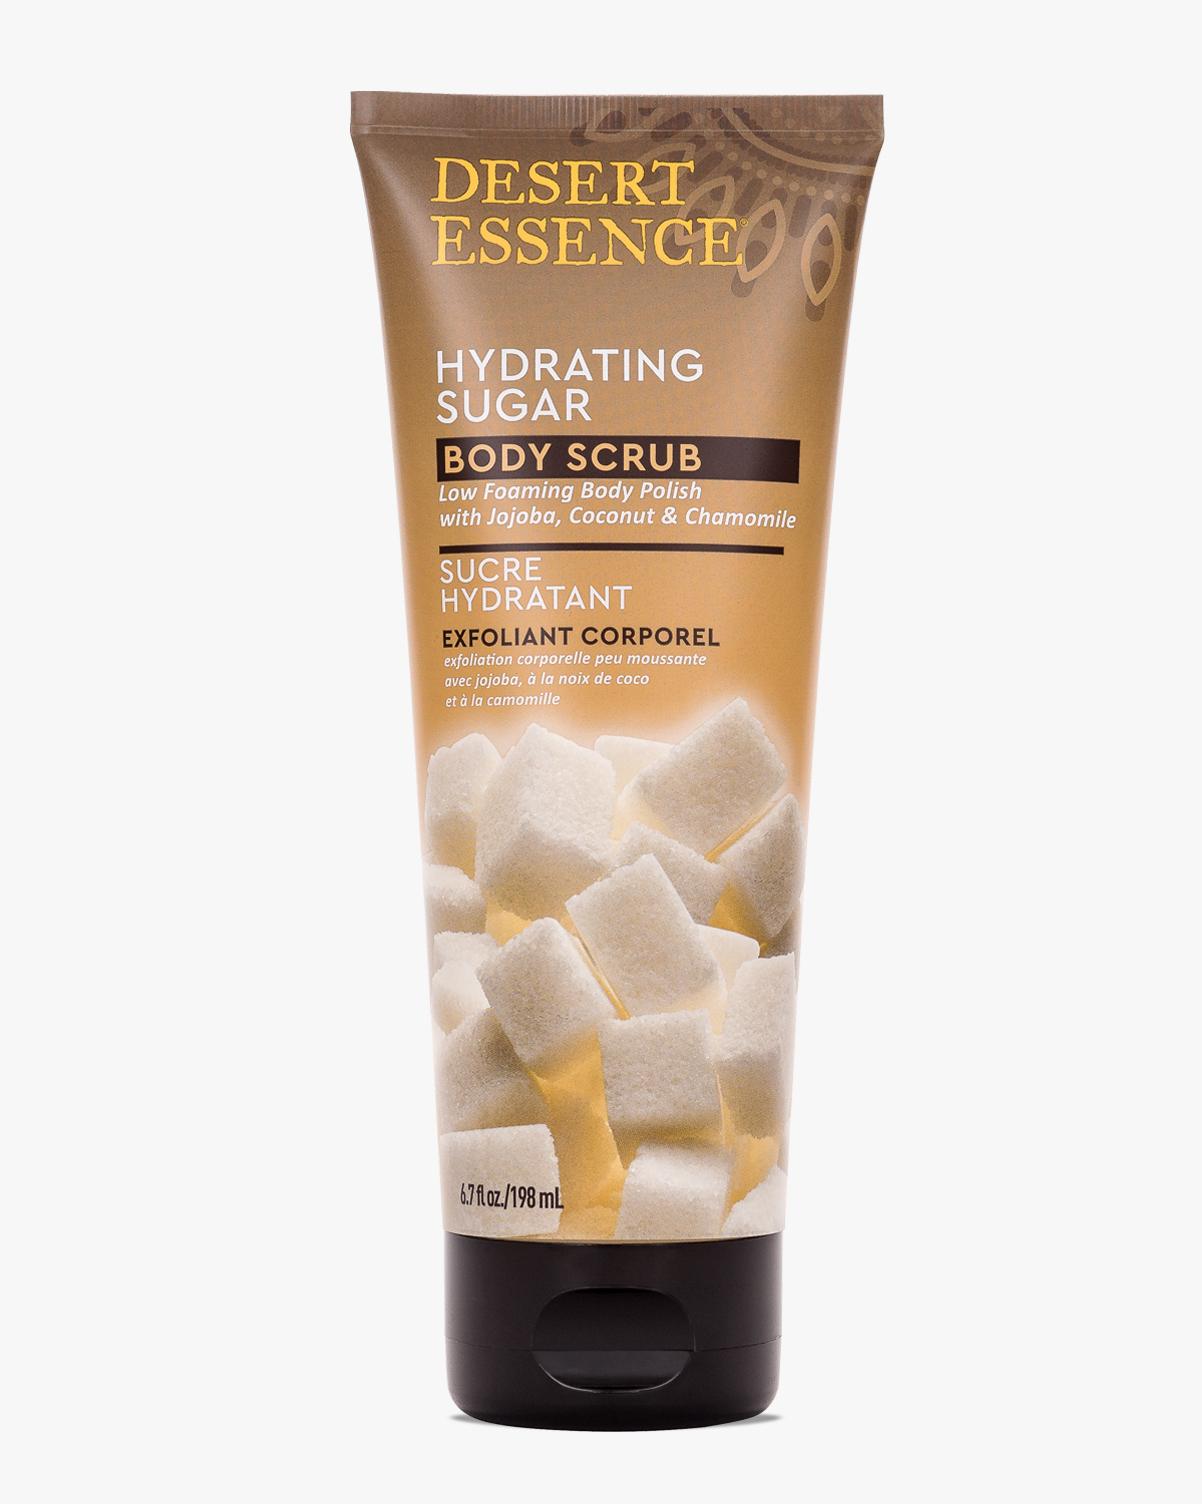 Desert Essence coupon: Desert Essence Hydrating Sugar Body Scrub, 6.7 fl. oz. | Vegan | Gluten-Free